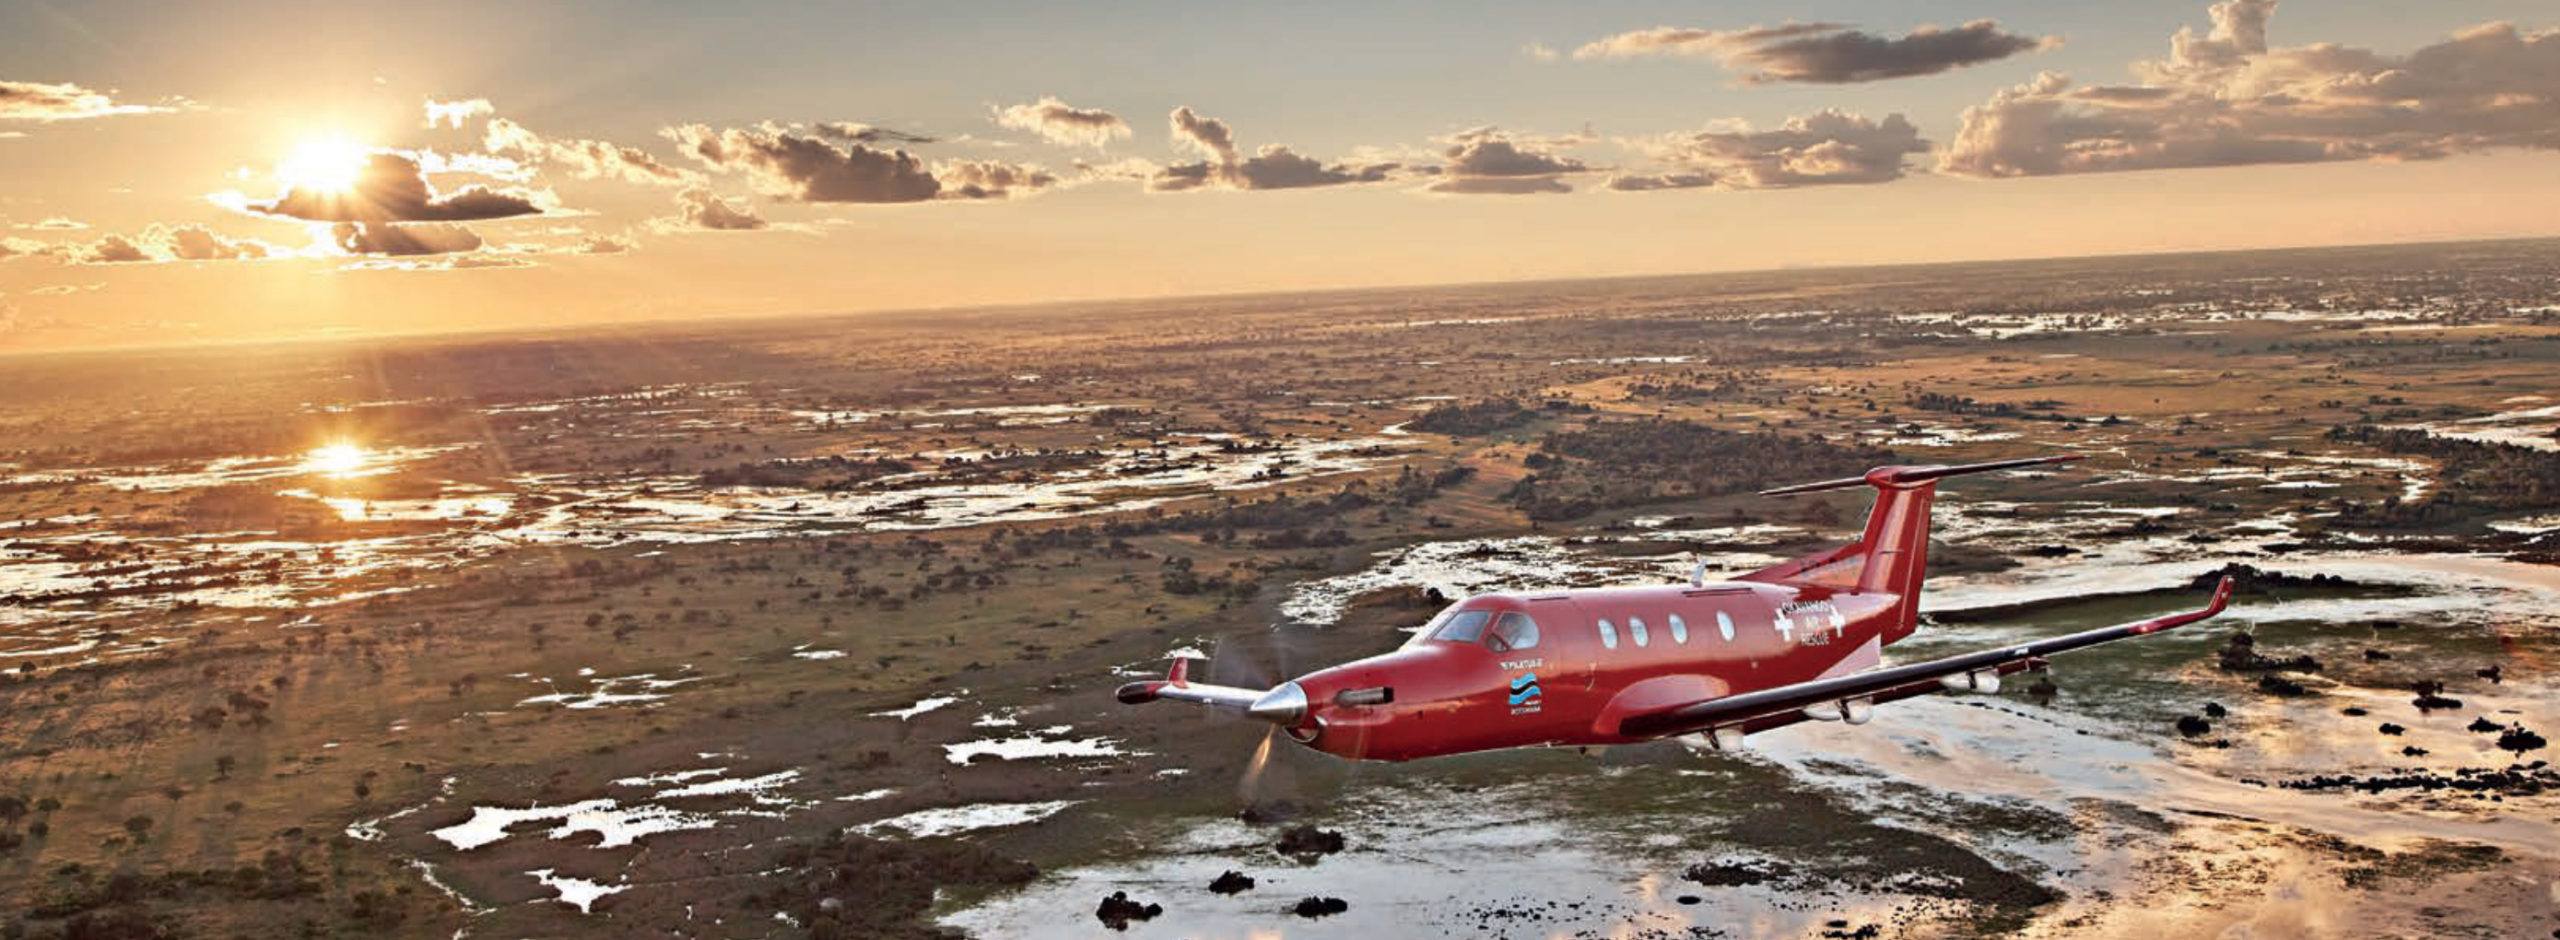 Servicio Médico Aéreo Okavango Air Rescue